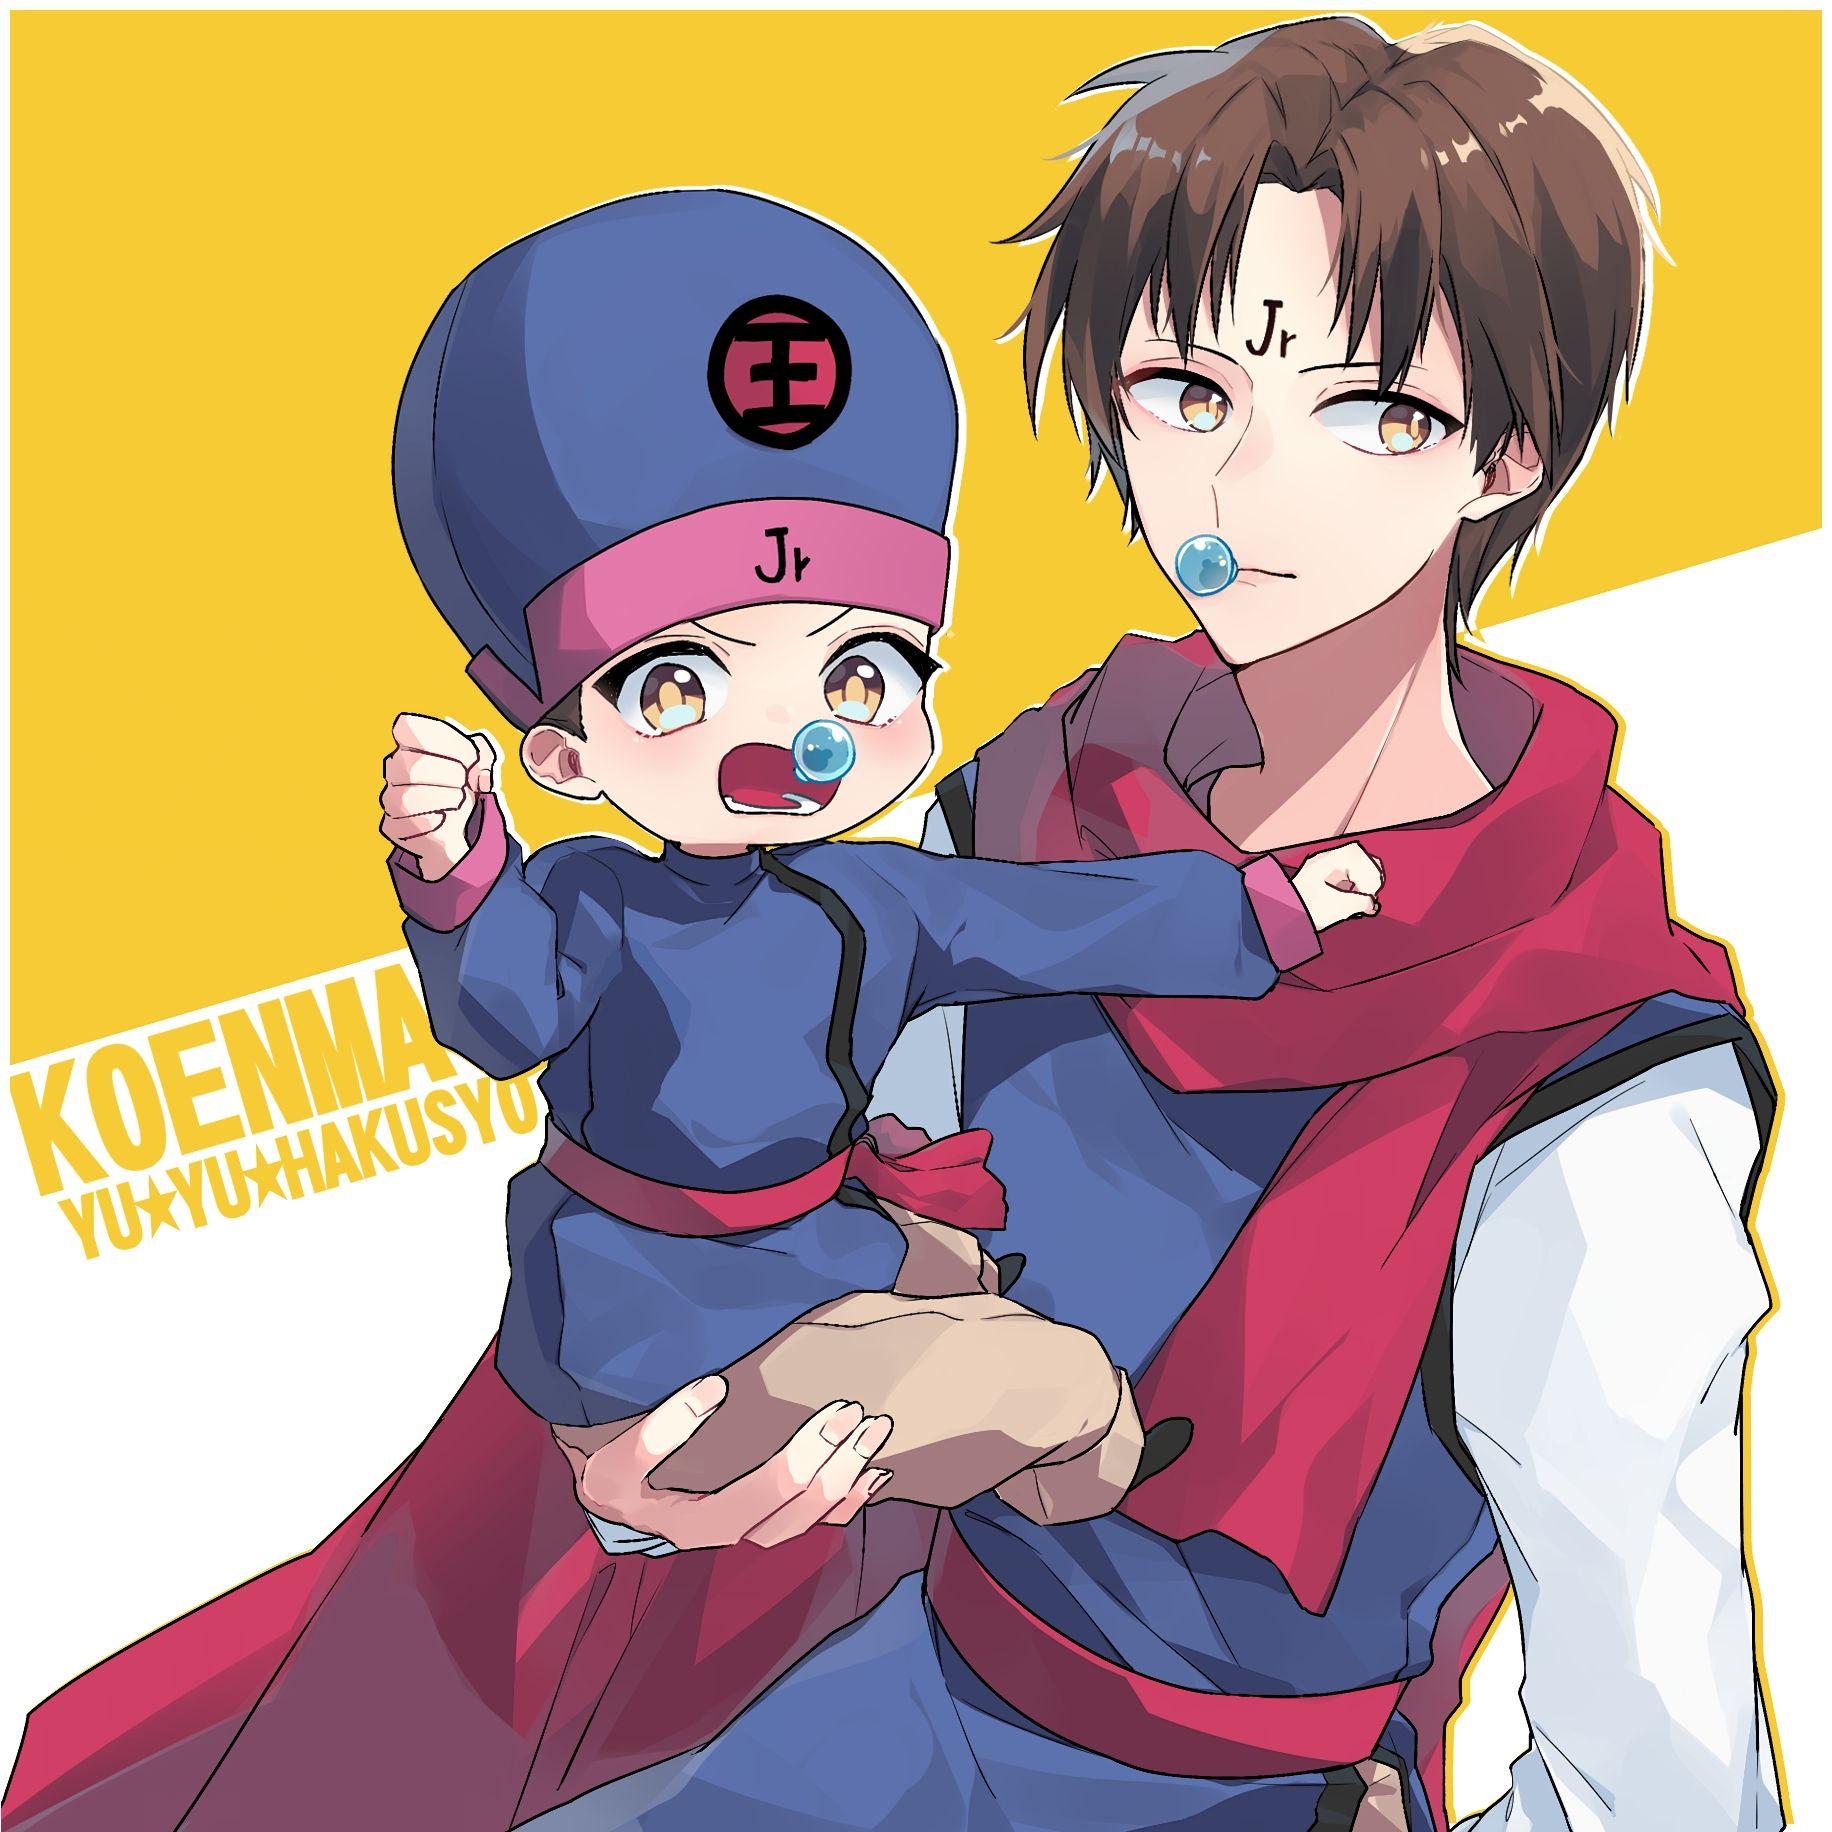 Pinterest Yuyu hakusho, Tv anime, Anime plus